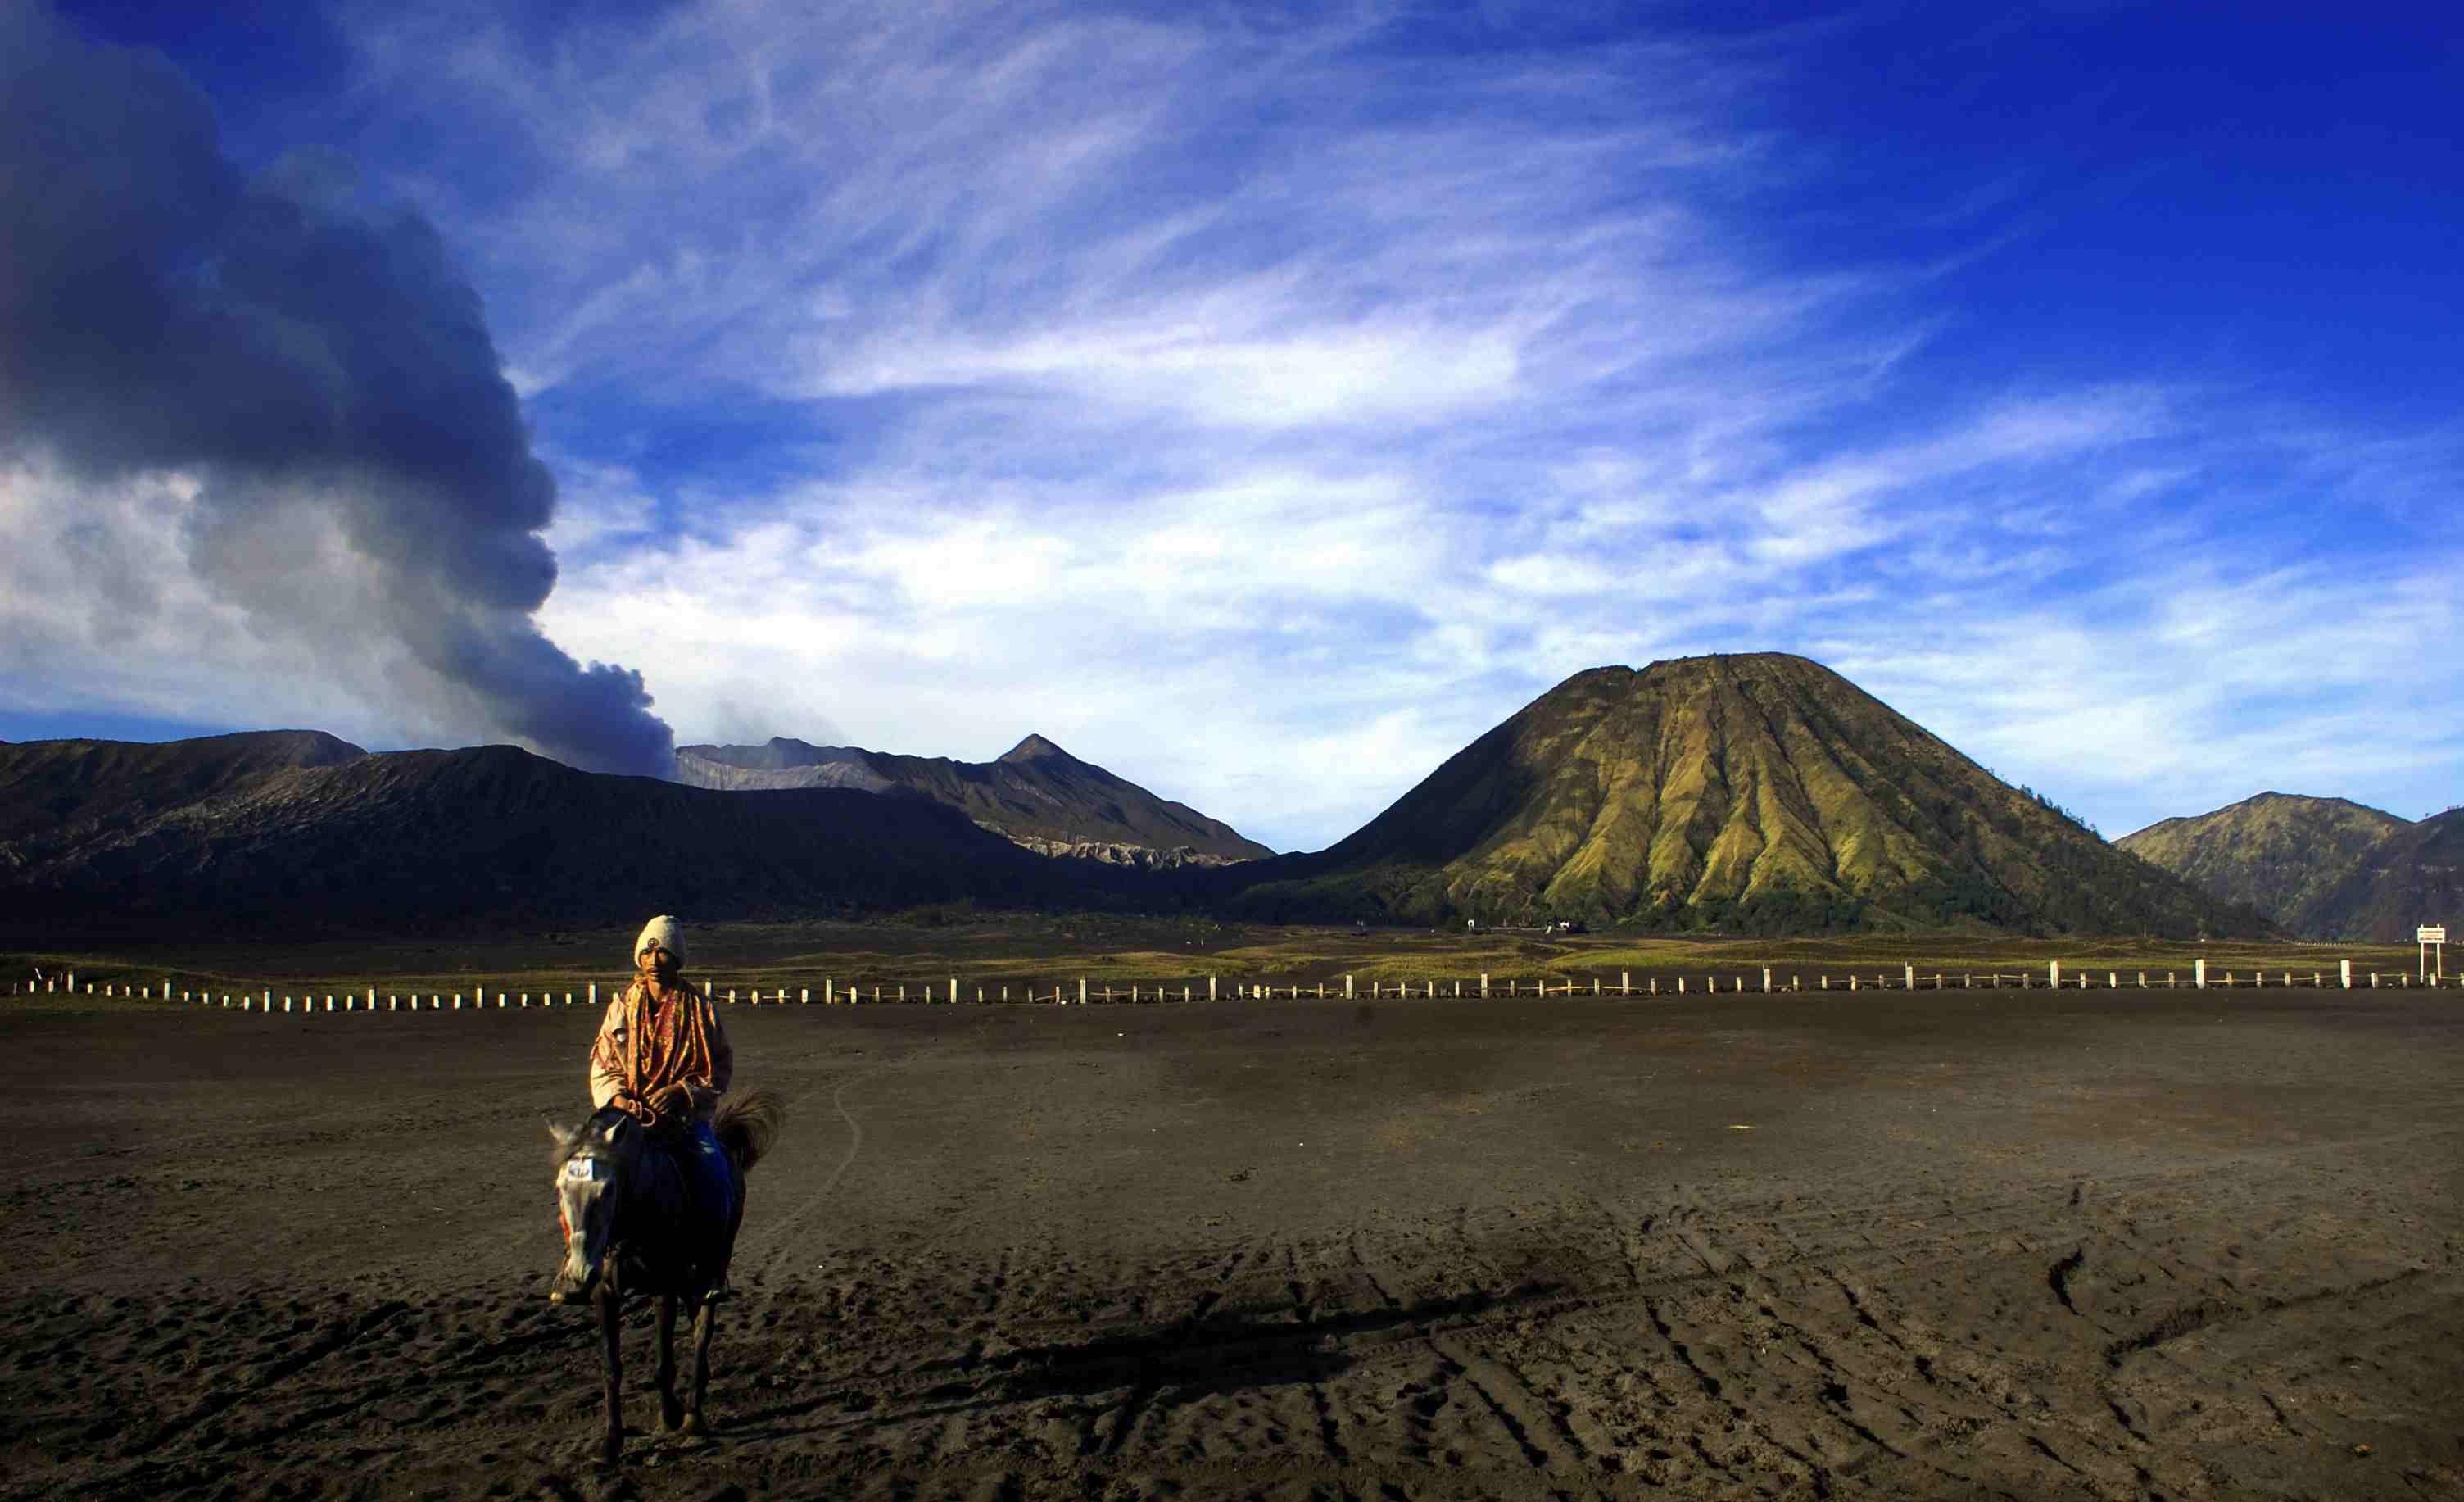 Paket Wisata Malang Bromo Batu 3 Hari 2 Malam Jabal Tour Pontianak